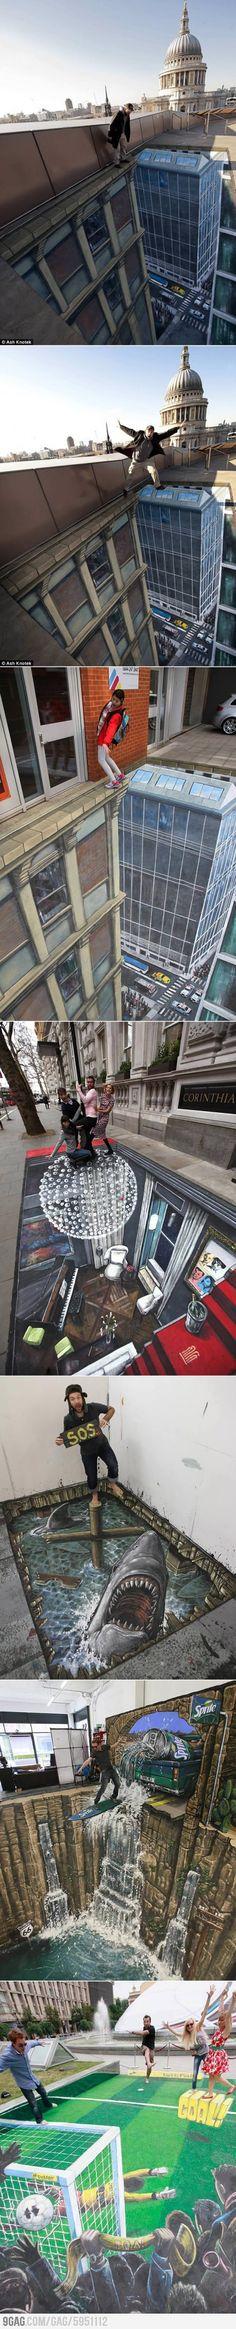 Great Pavement Art Selection